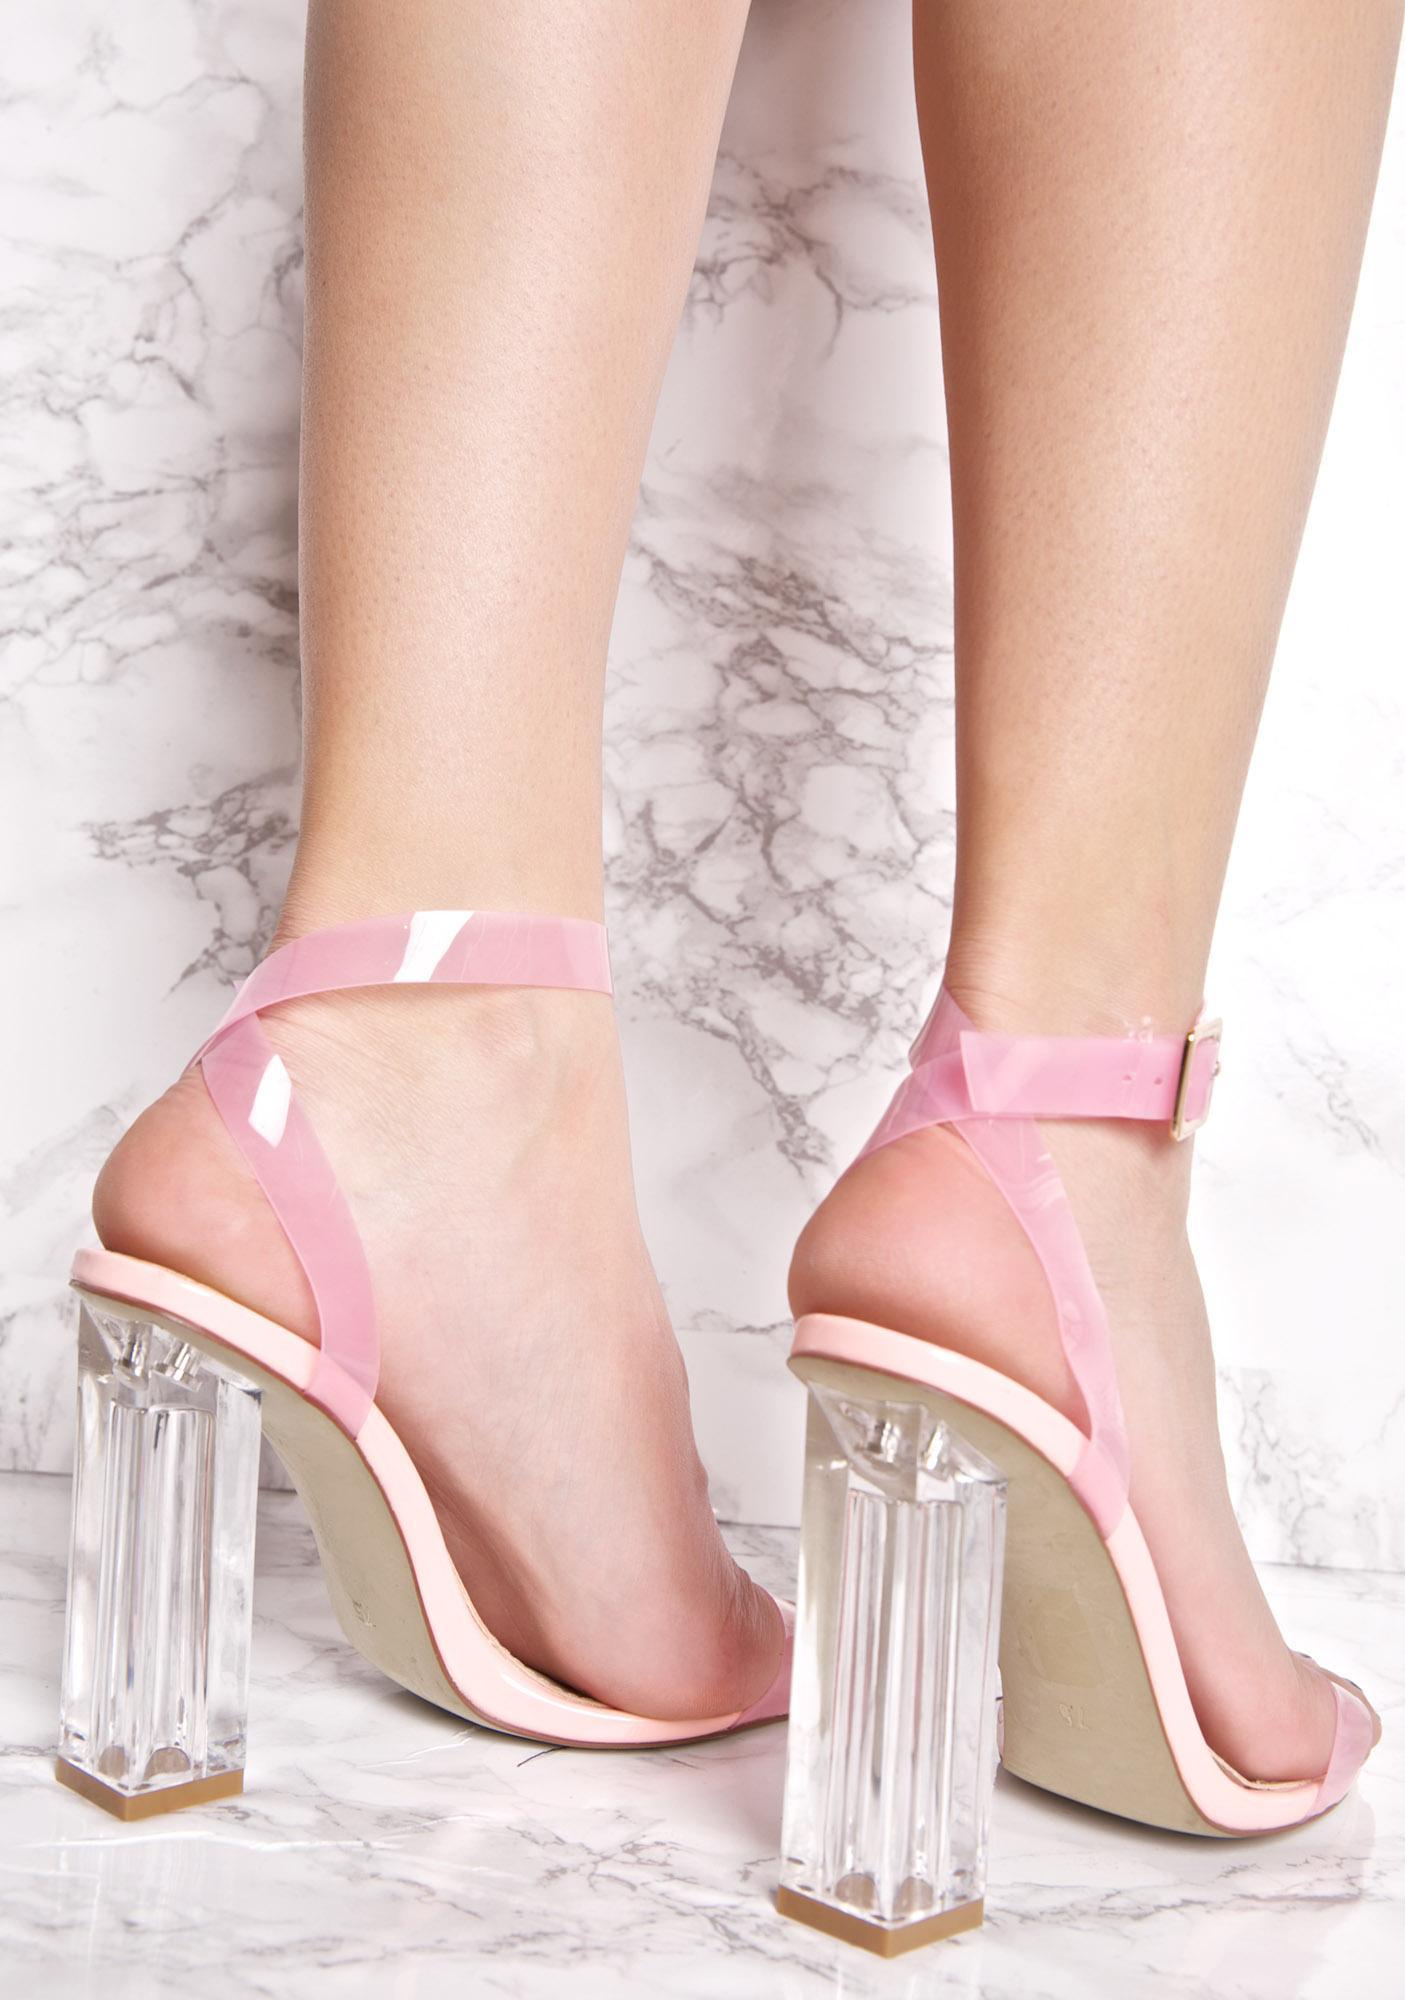 b3a5c66a71e ... Sweet Venus Lucite Heels ...